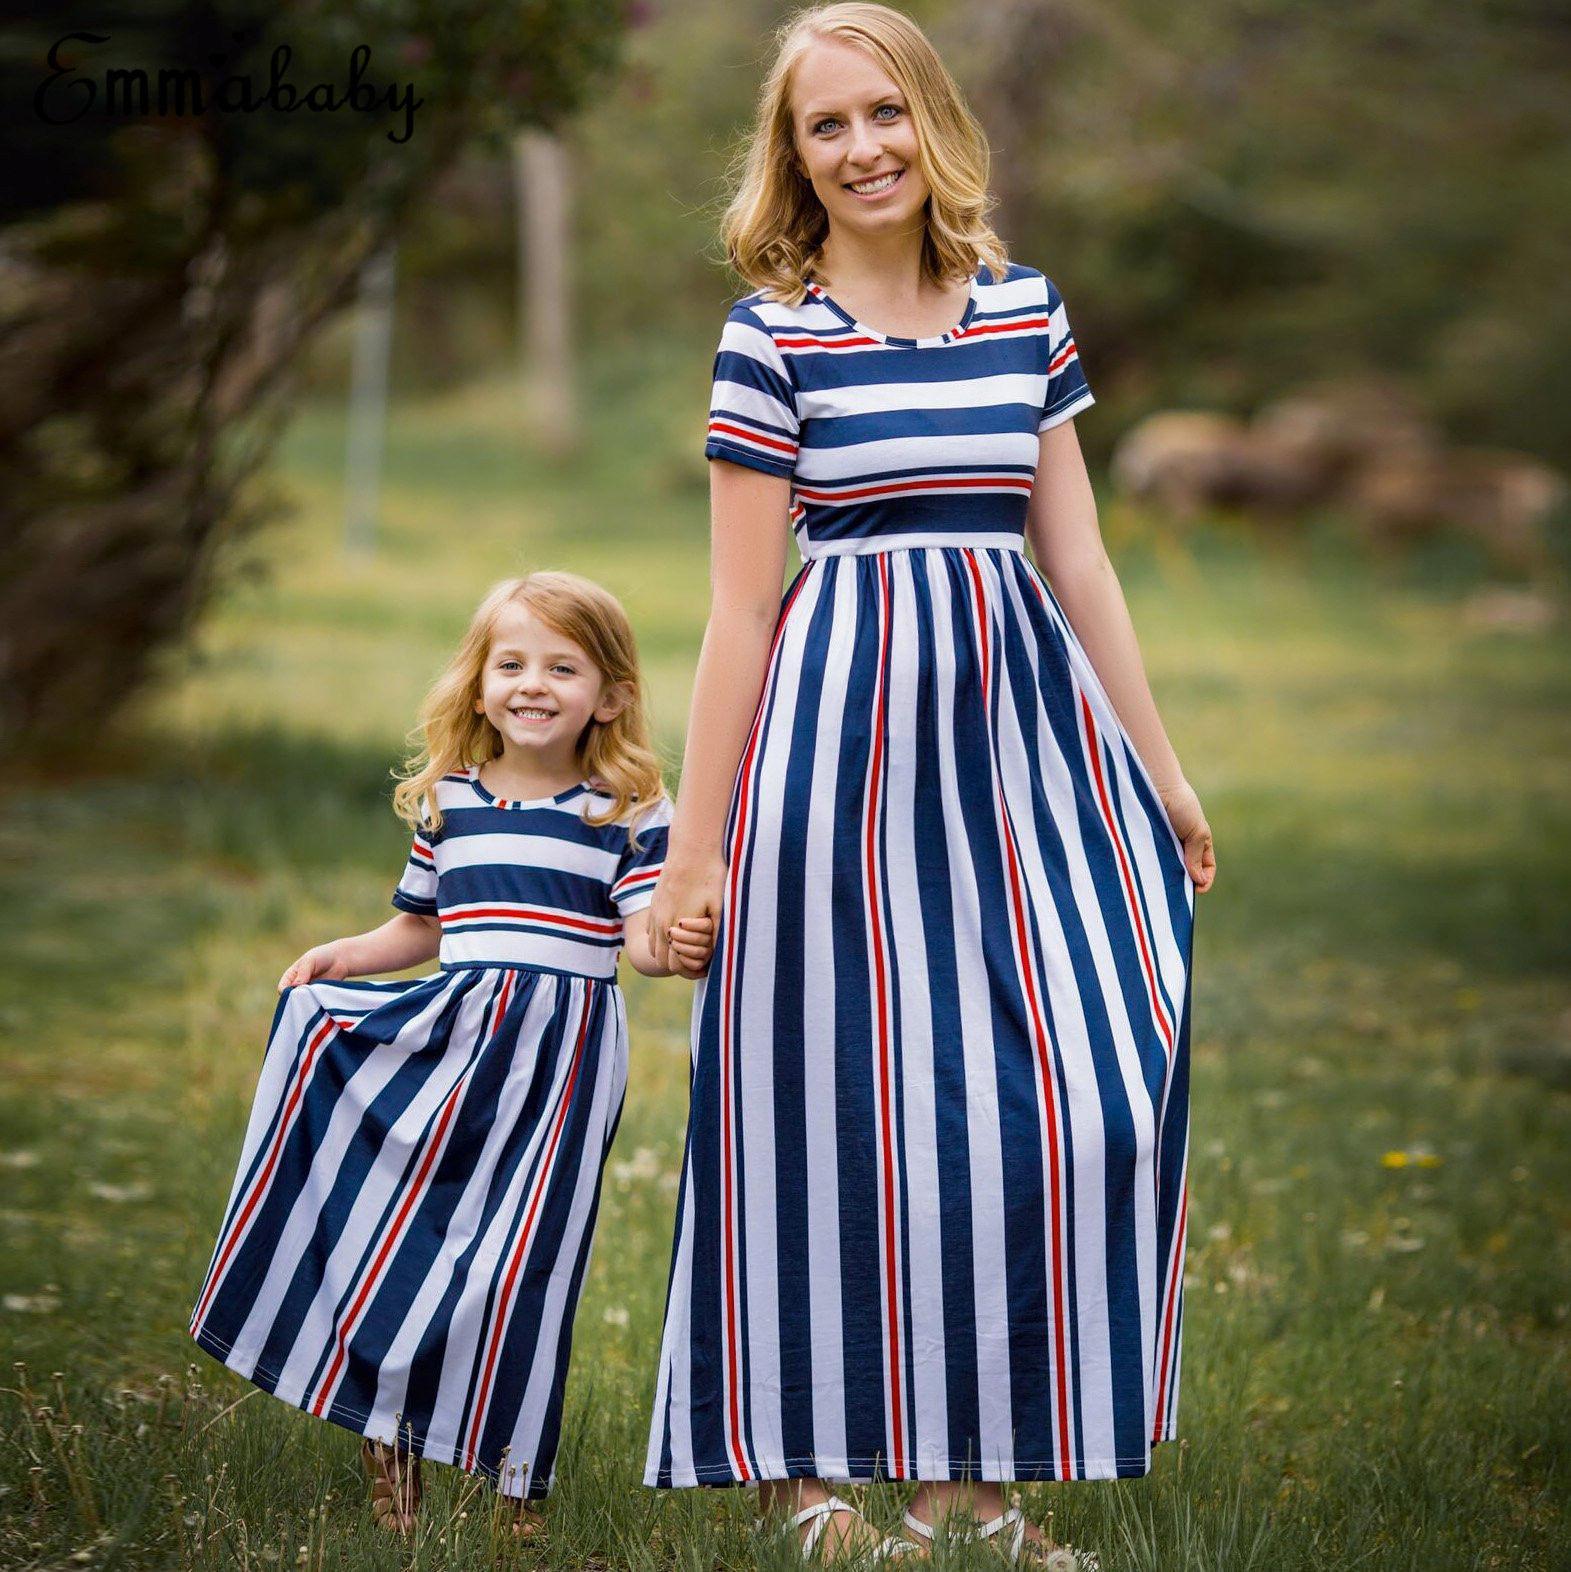 Robe famille Mère et fille Matching filles fille Stripe cheville longueur robe